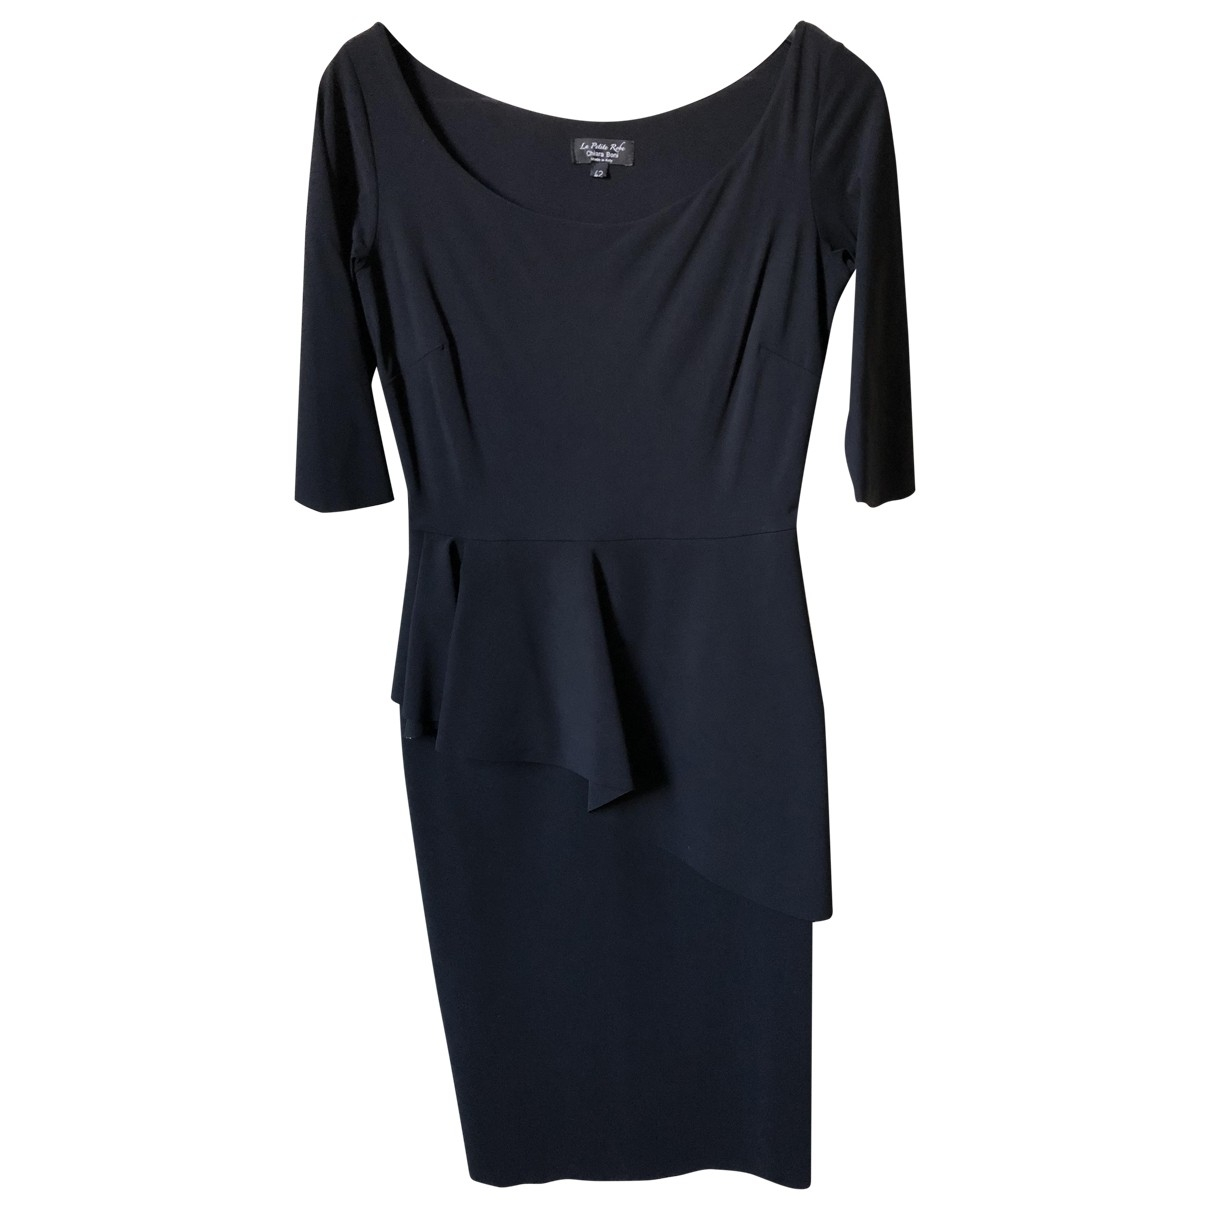 Chiara Boni \N Kleid in  Schwarz Polyester